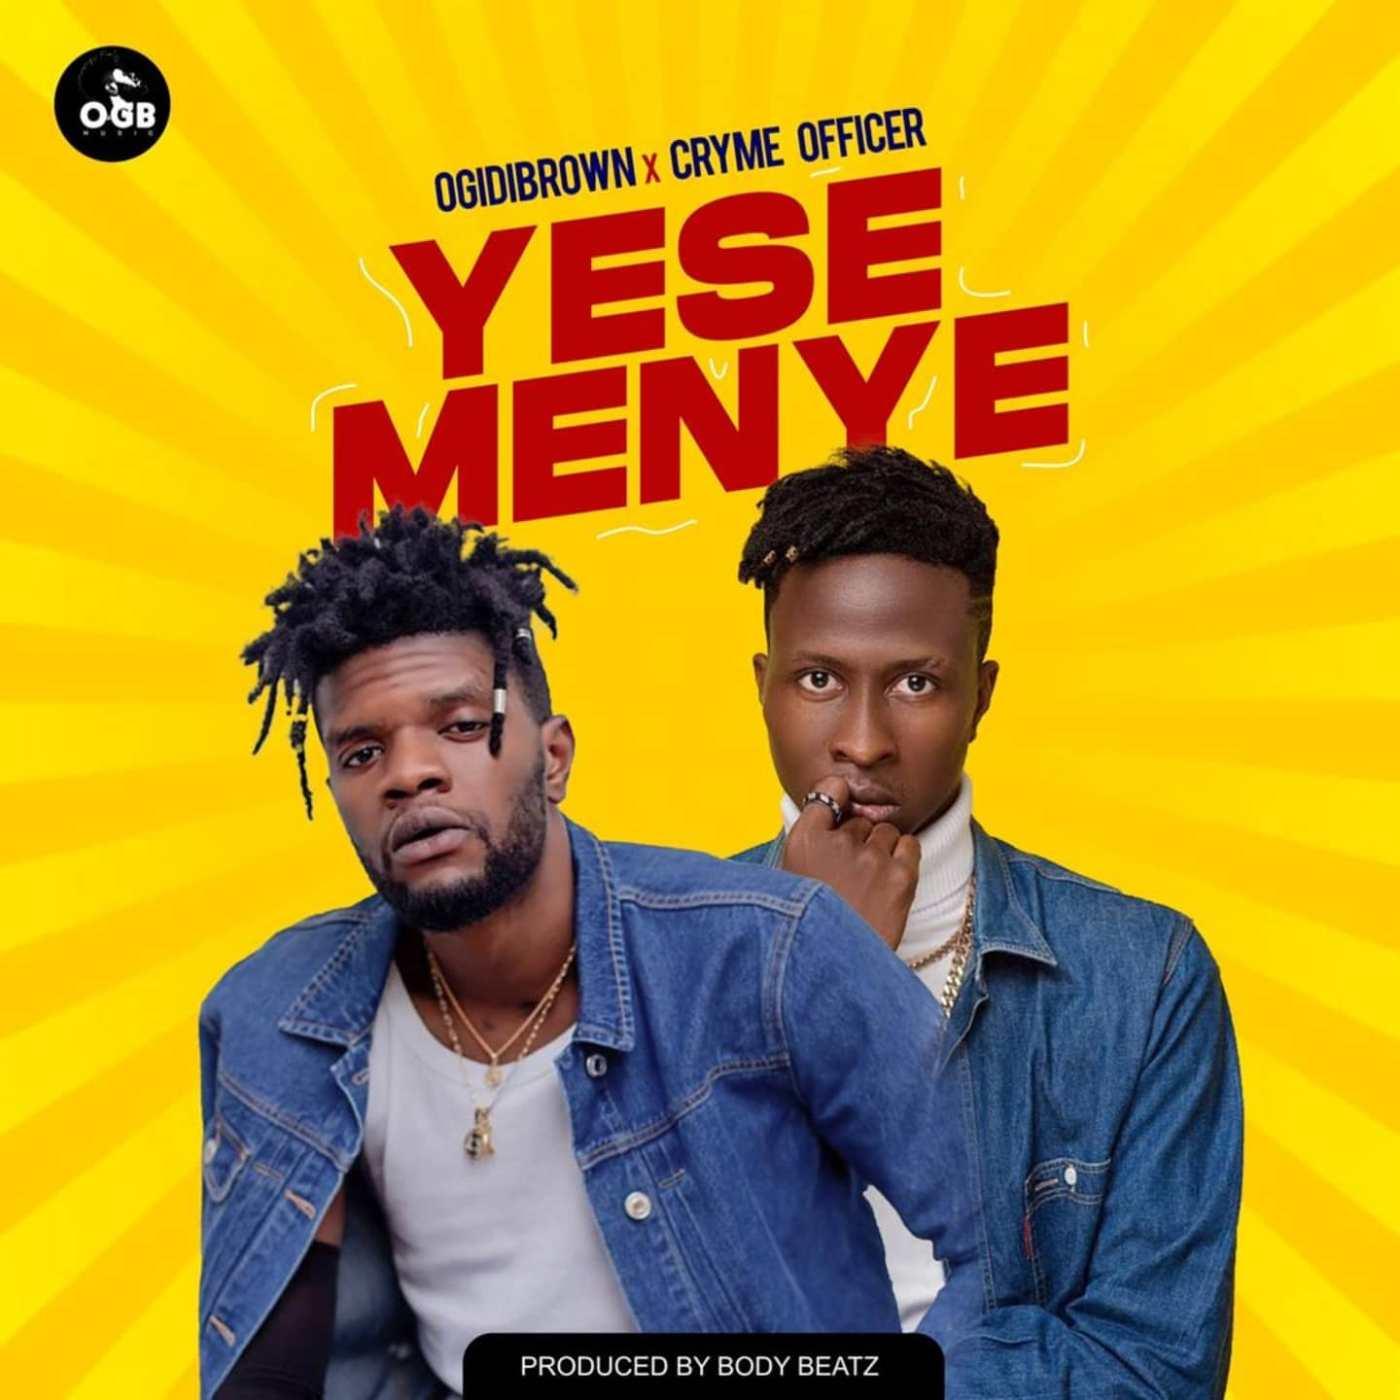 Ogidi Brown & Cryme Officer - Yese Menye